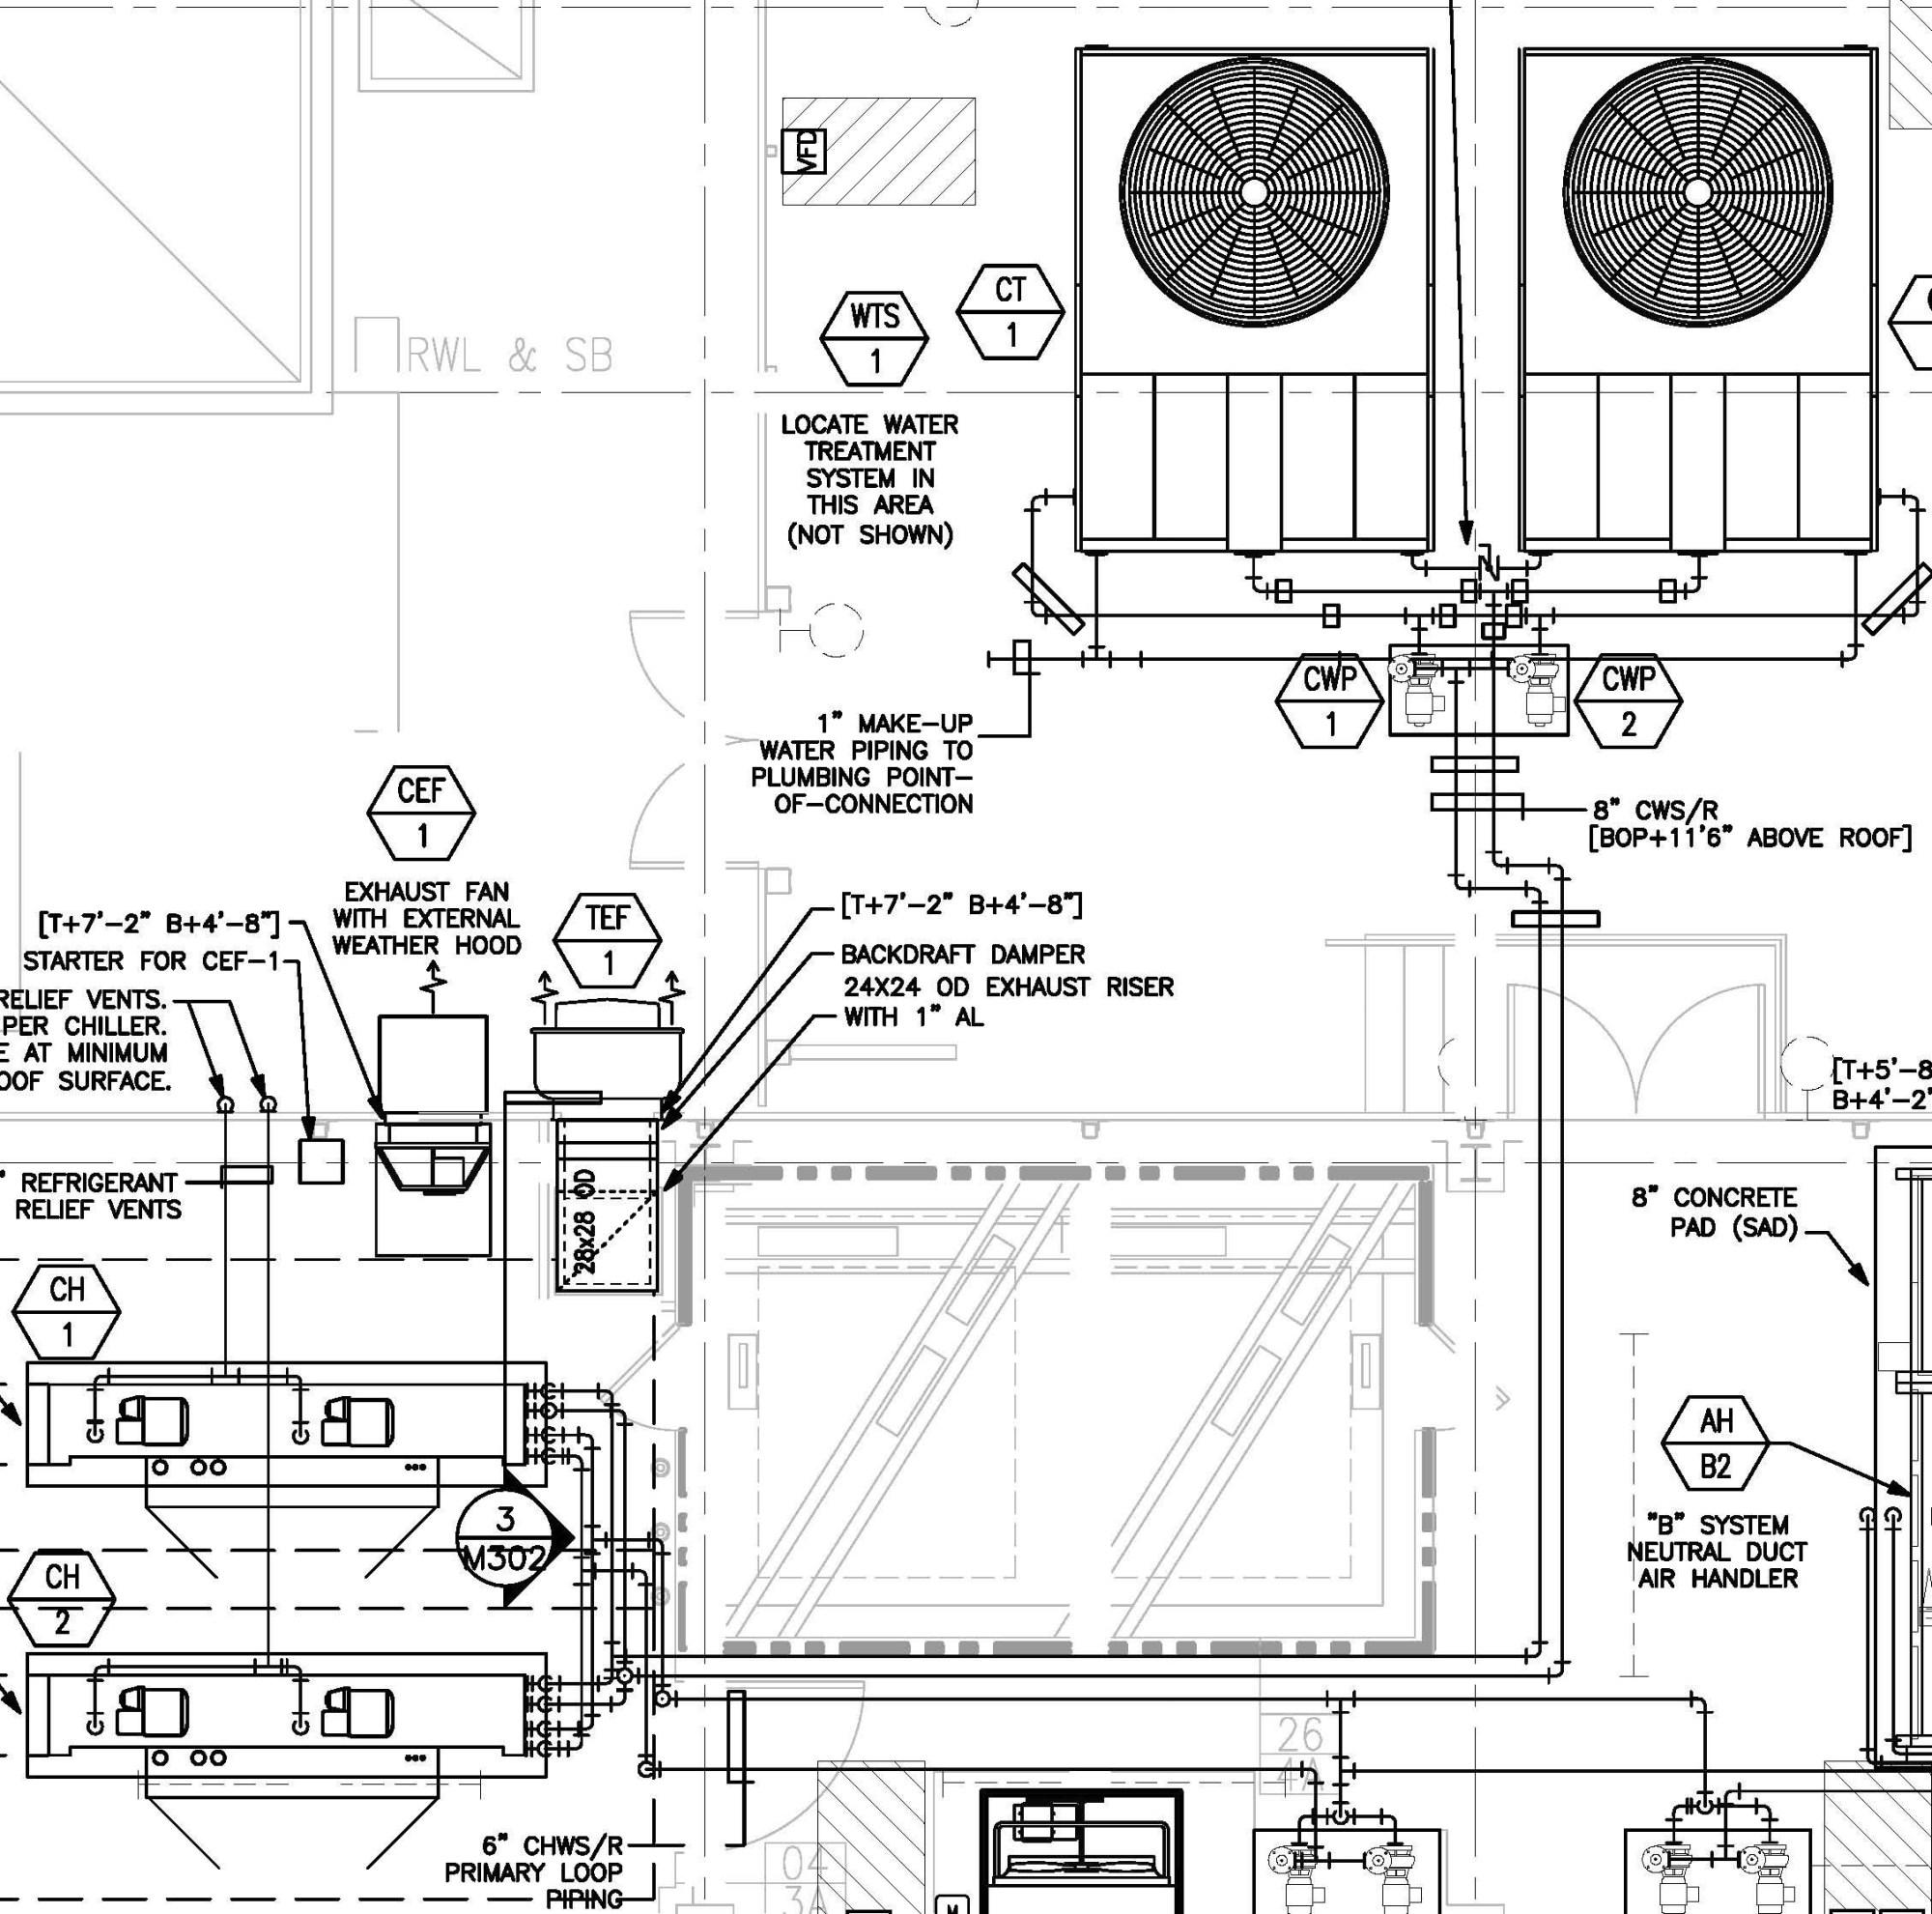 hight resolution of rheem rte 13 wiring diagram rheem hvac wiring diagram inspirationa rheem ac wiring diagram refrence